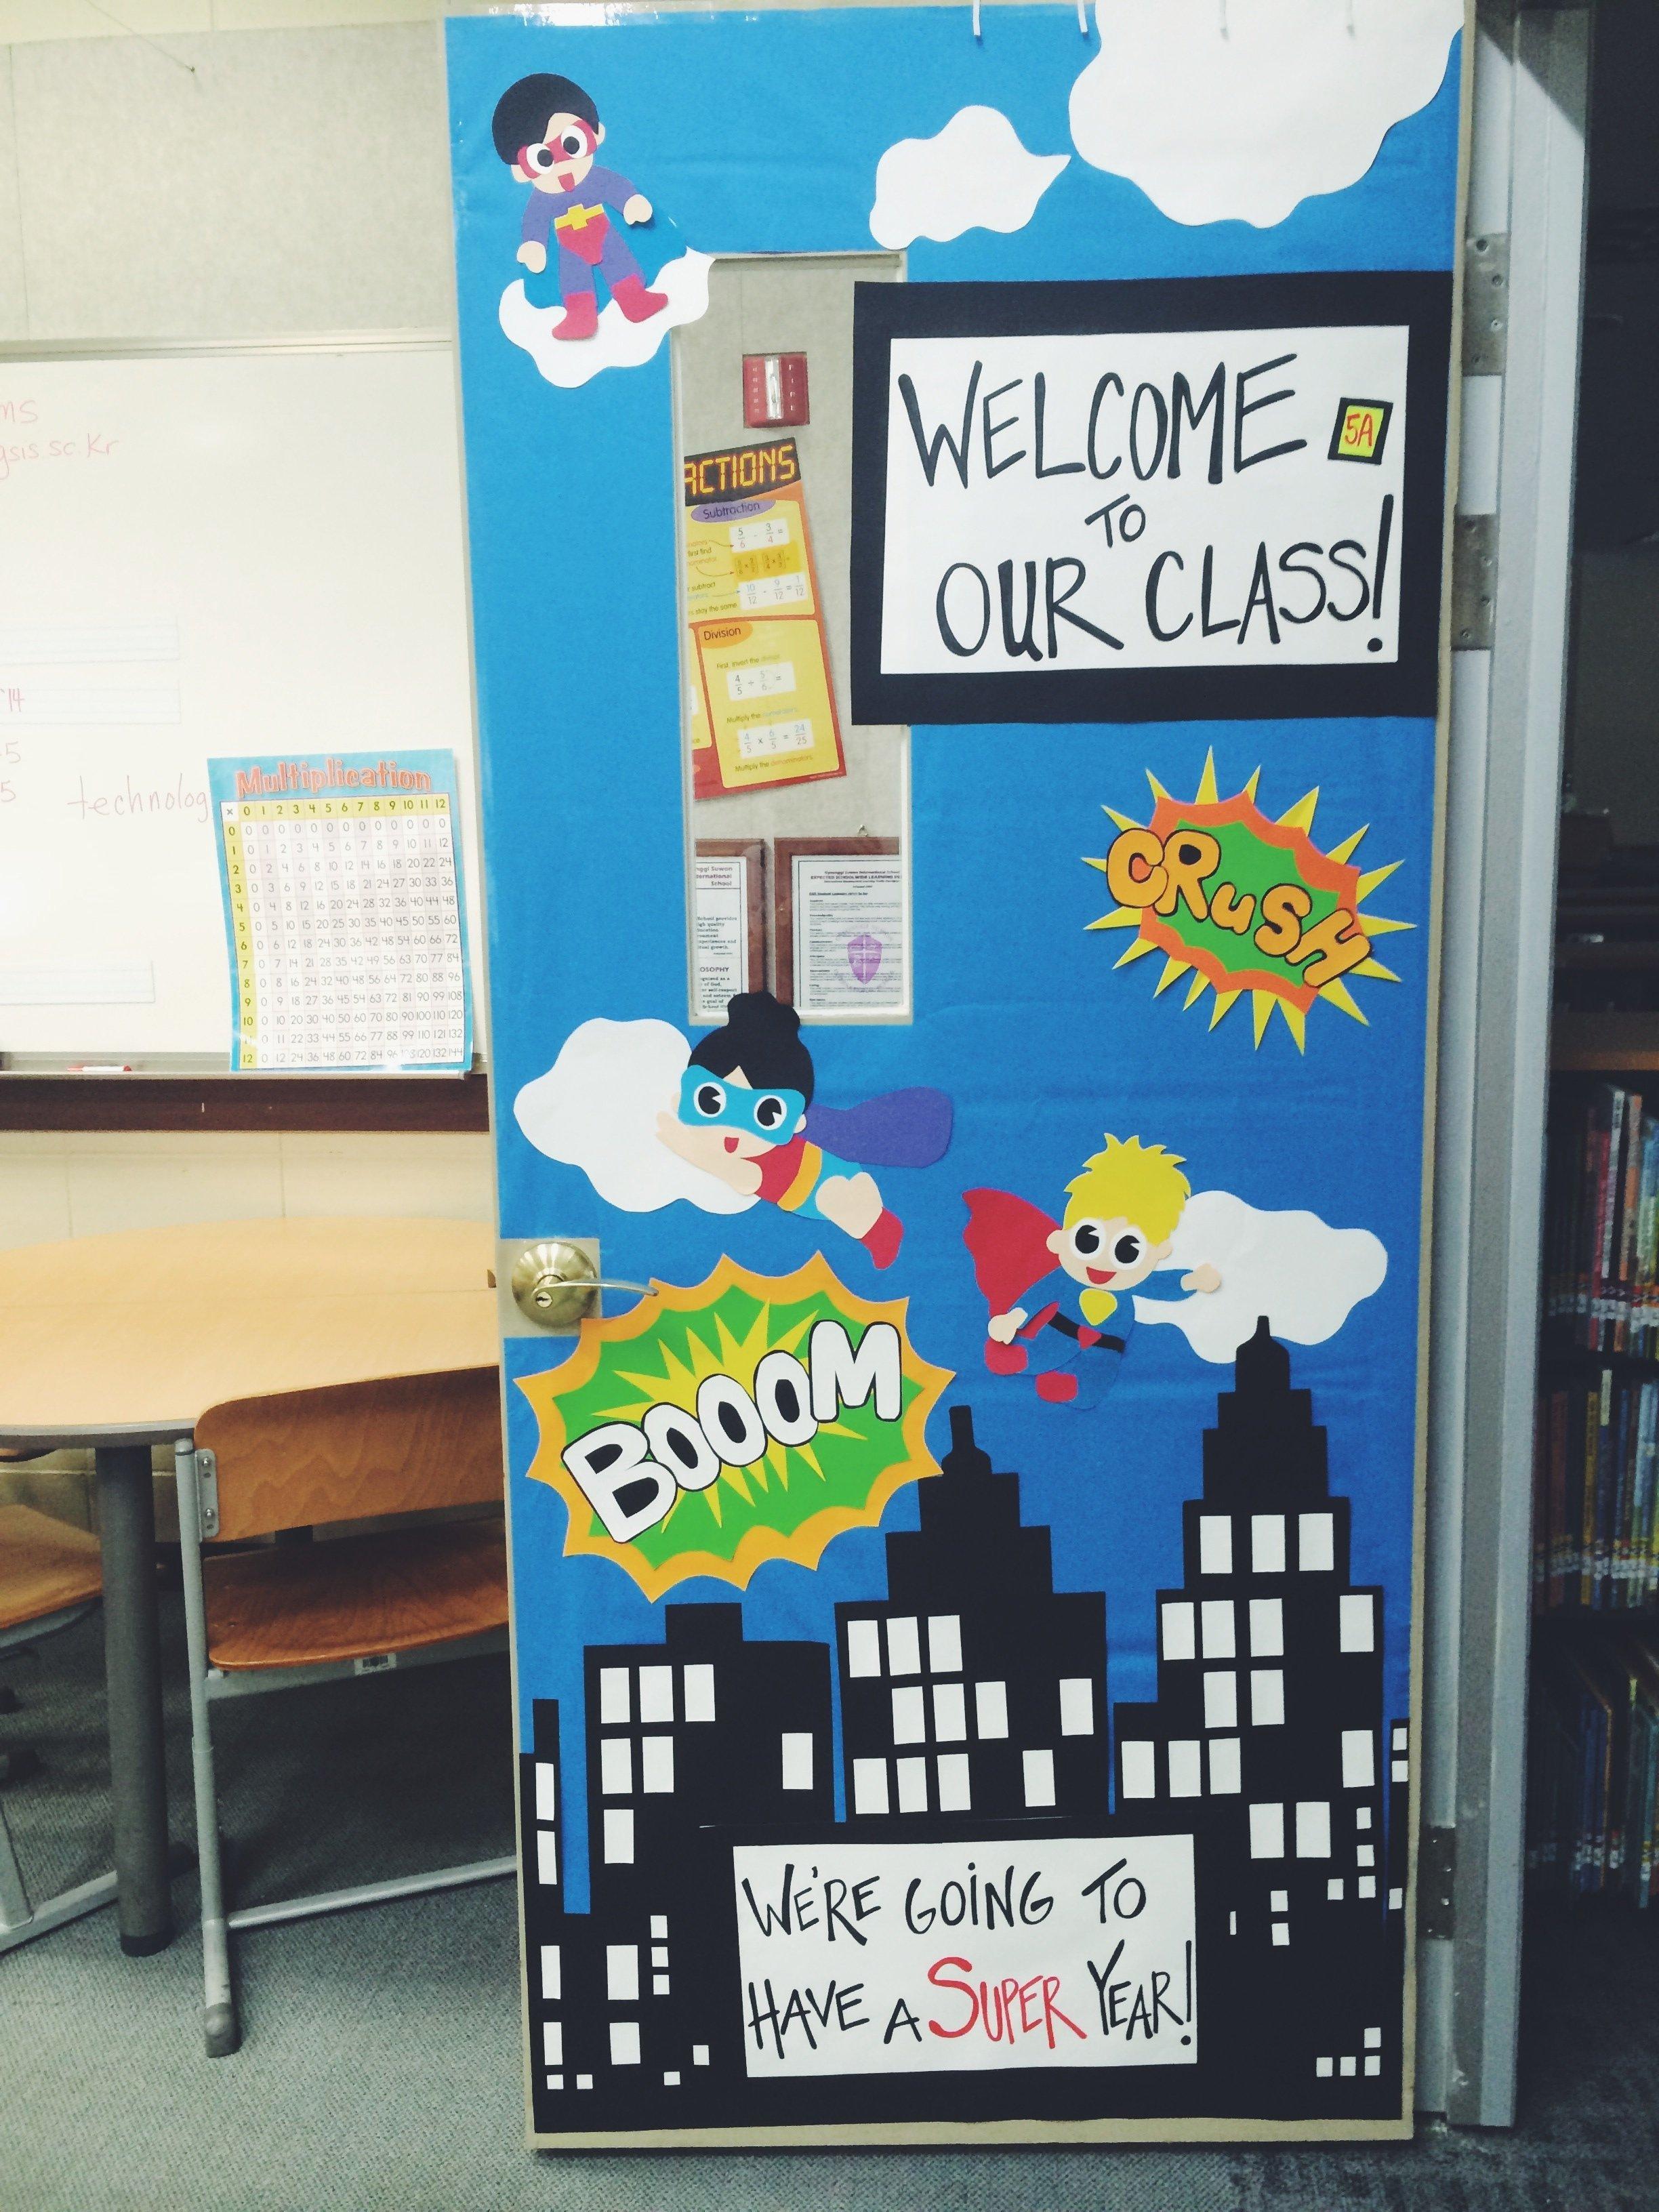 10 Beautiful Back To School Decoration Ideas ides de welcome back to school decorations galerie dimages 1 2020